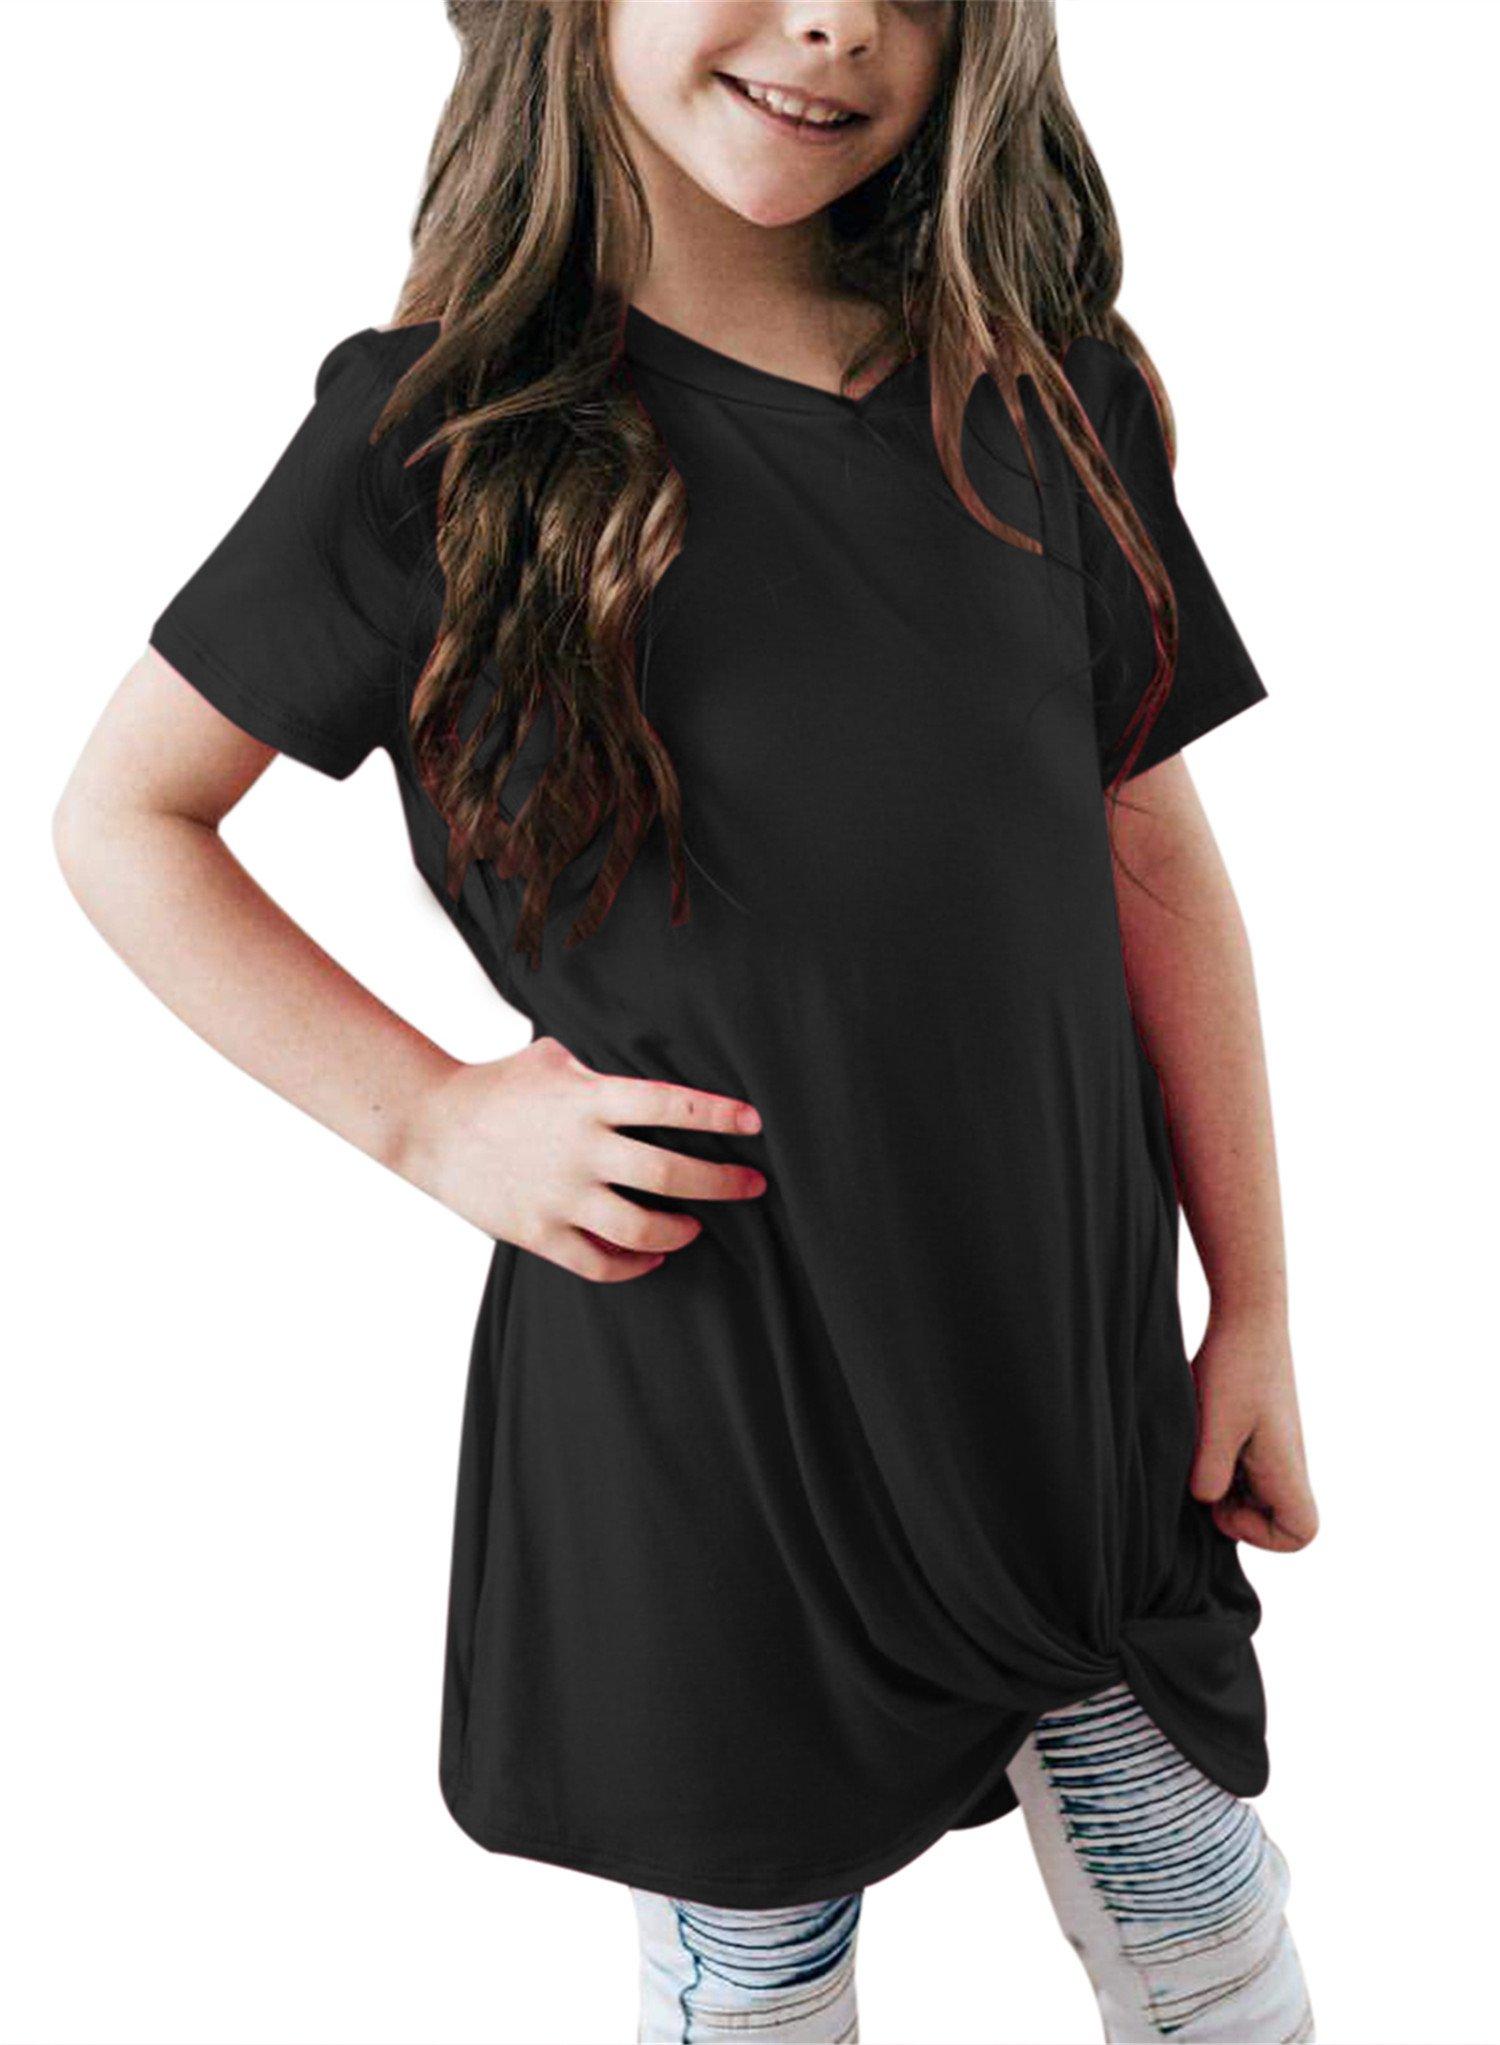 Bulawoo Girls Casual Loose Short Sleeve Tunic Tops Knot Front Big Girls Fashion Tops Tee Shirts Size 4-13 12-13 Years Black